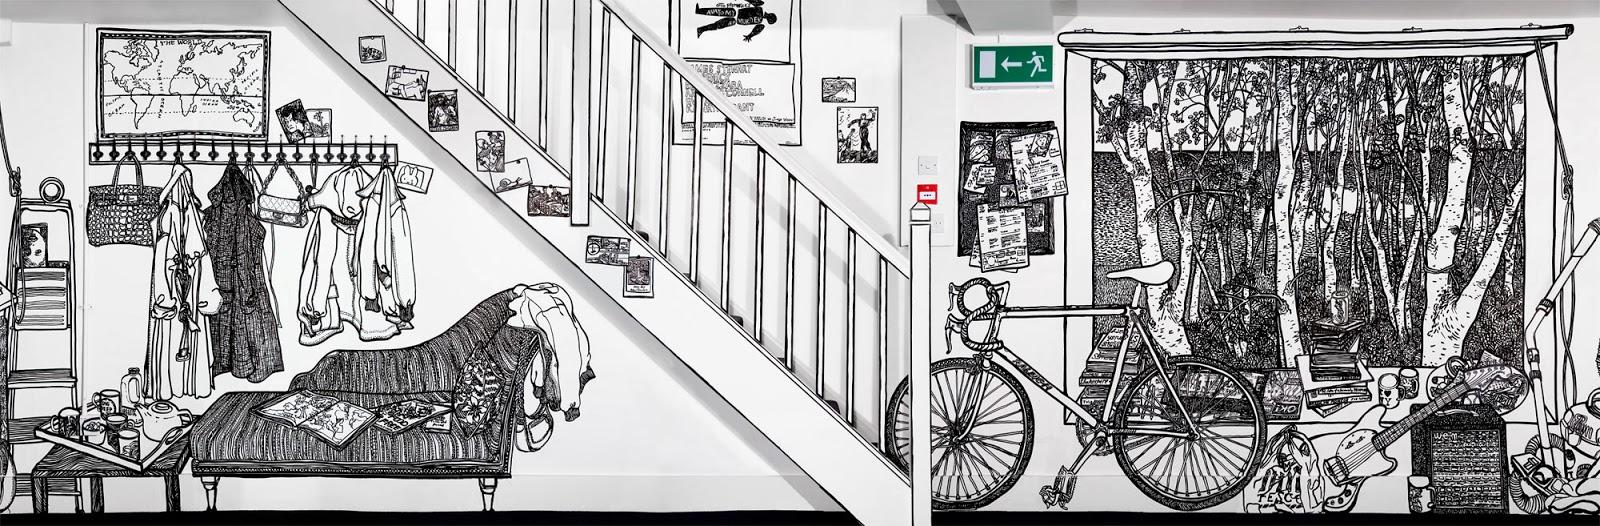 07-Artist-Charlotte-Mann-Draw-on-Walls-www-designstack-co